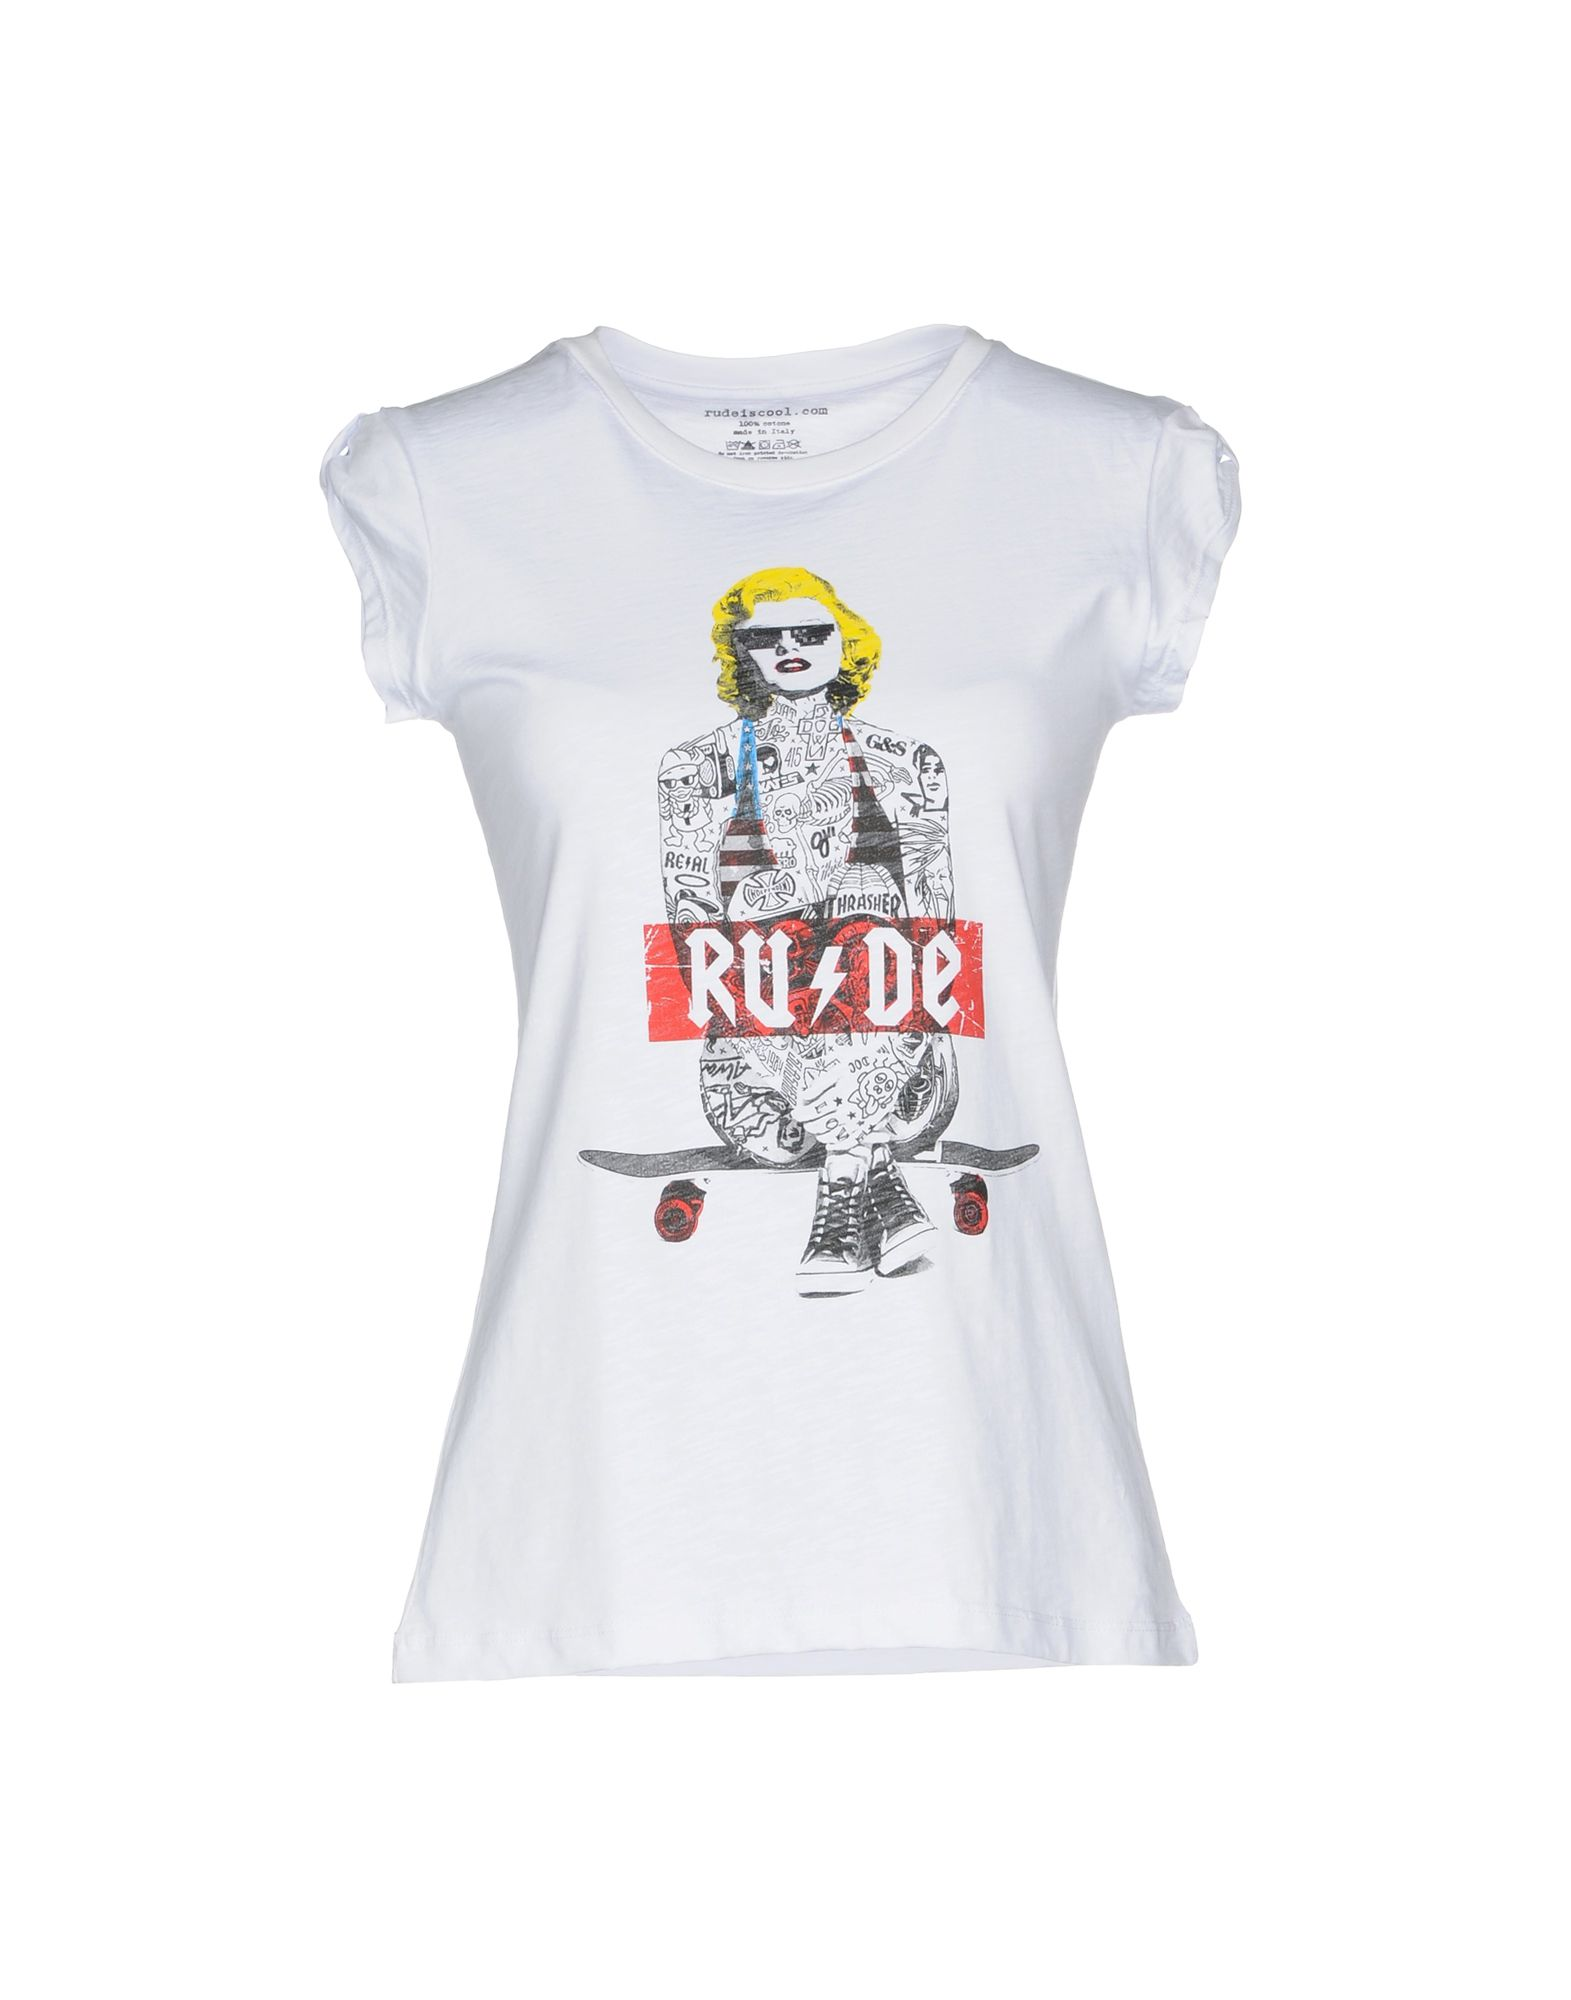 RUDE IS COOL Футболка футболка rude riders футболка